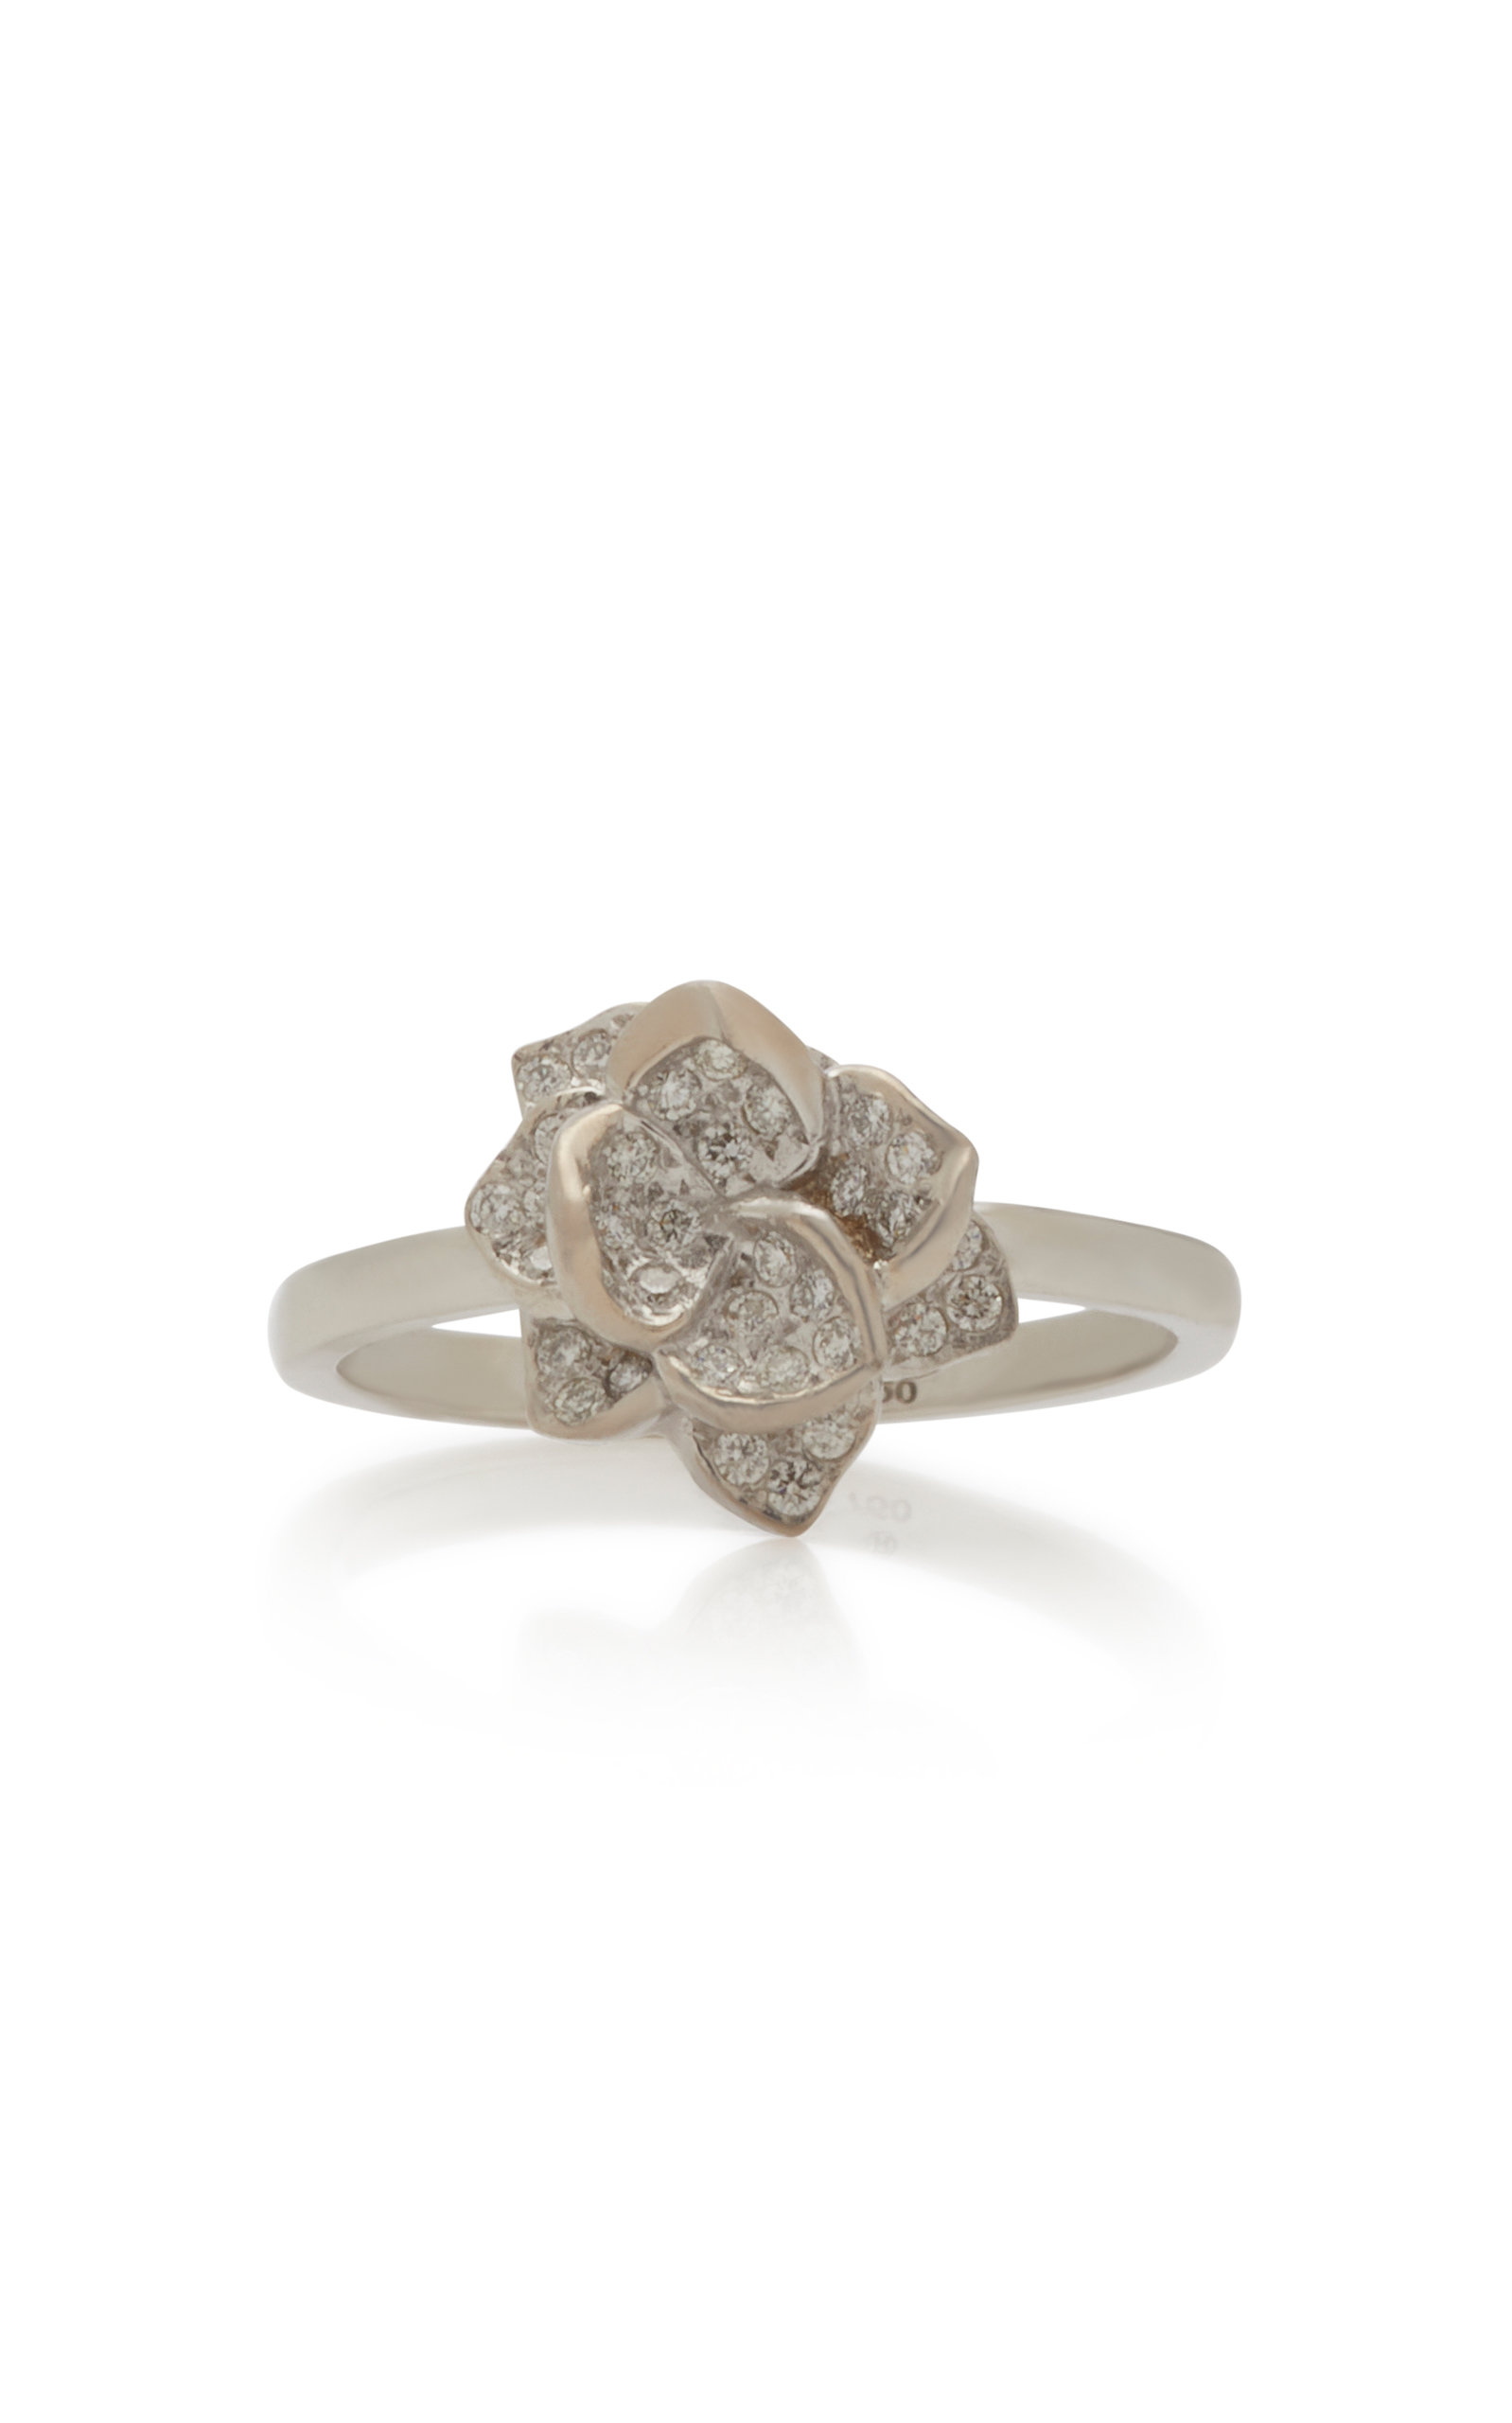 Colette Jewelry - Women's 18K White Gold Diamond Ring - White - Moda Operandi